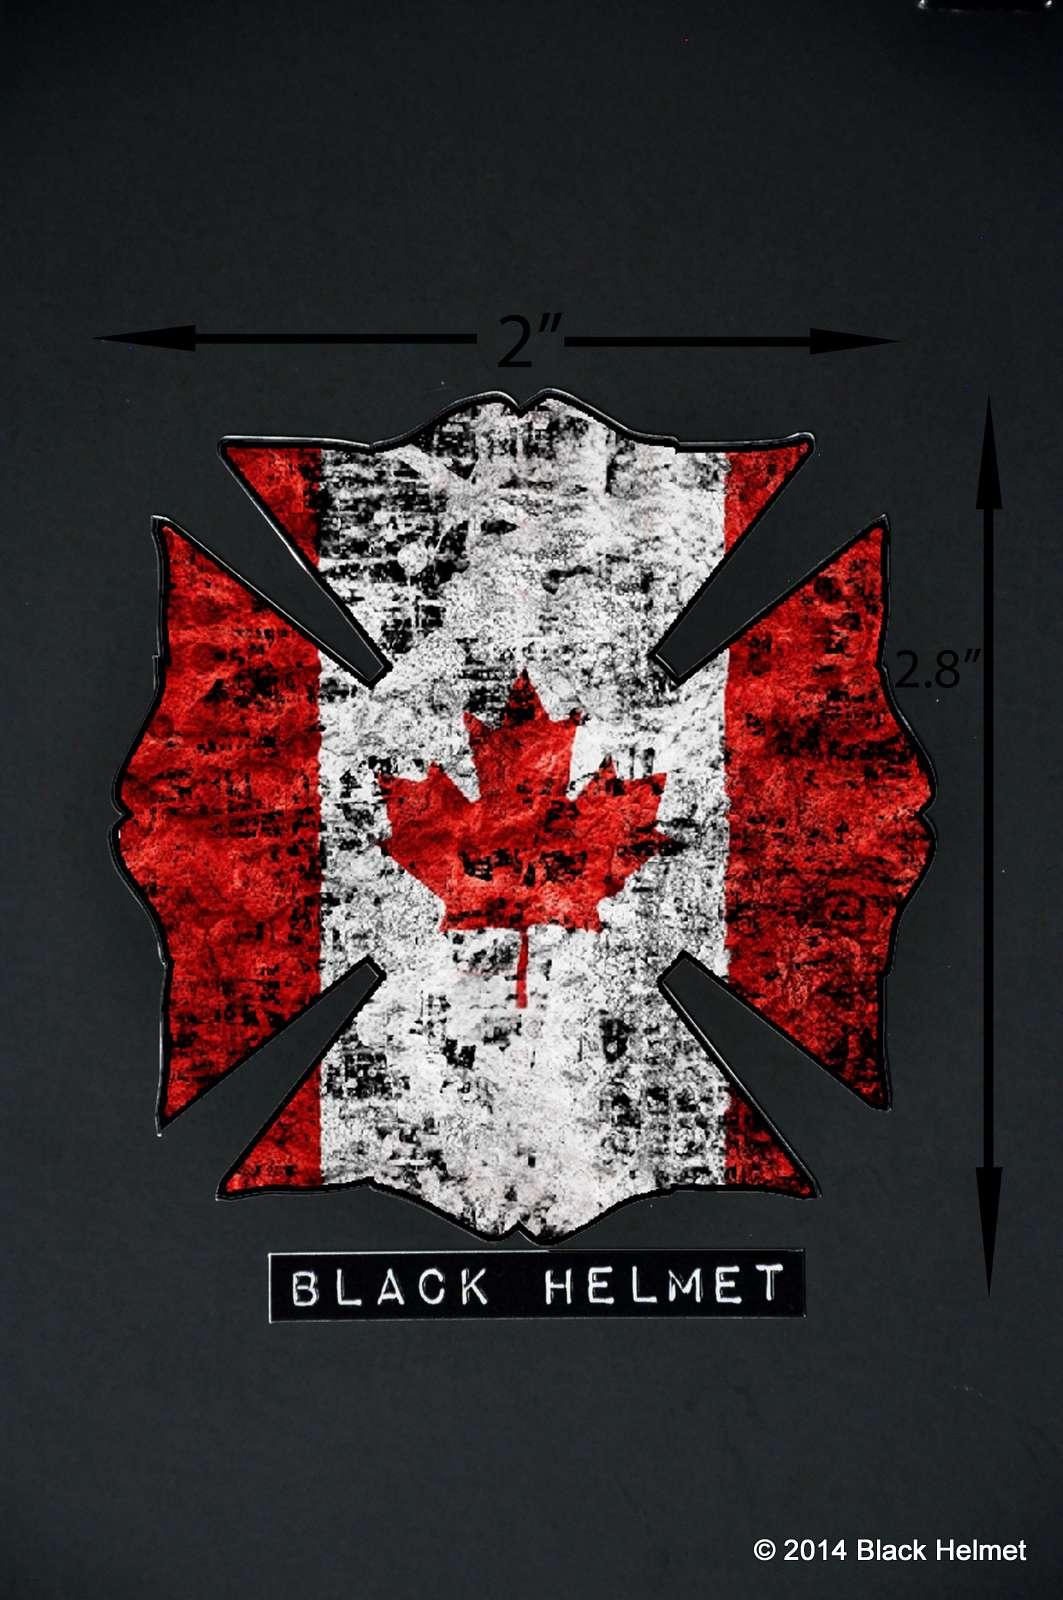 firefighter helmet decals fire helmet decals fresh vinyl wall decal sticker  firefighter helmet fireman helmet decals